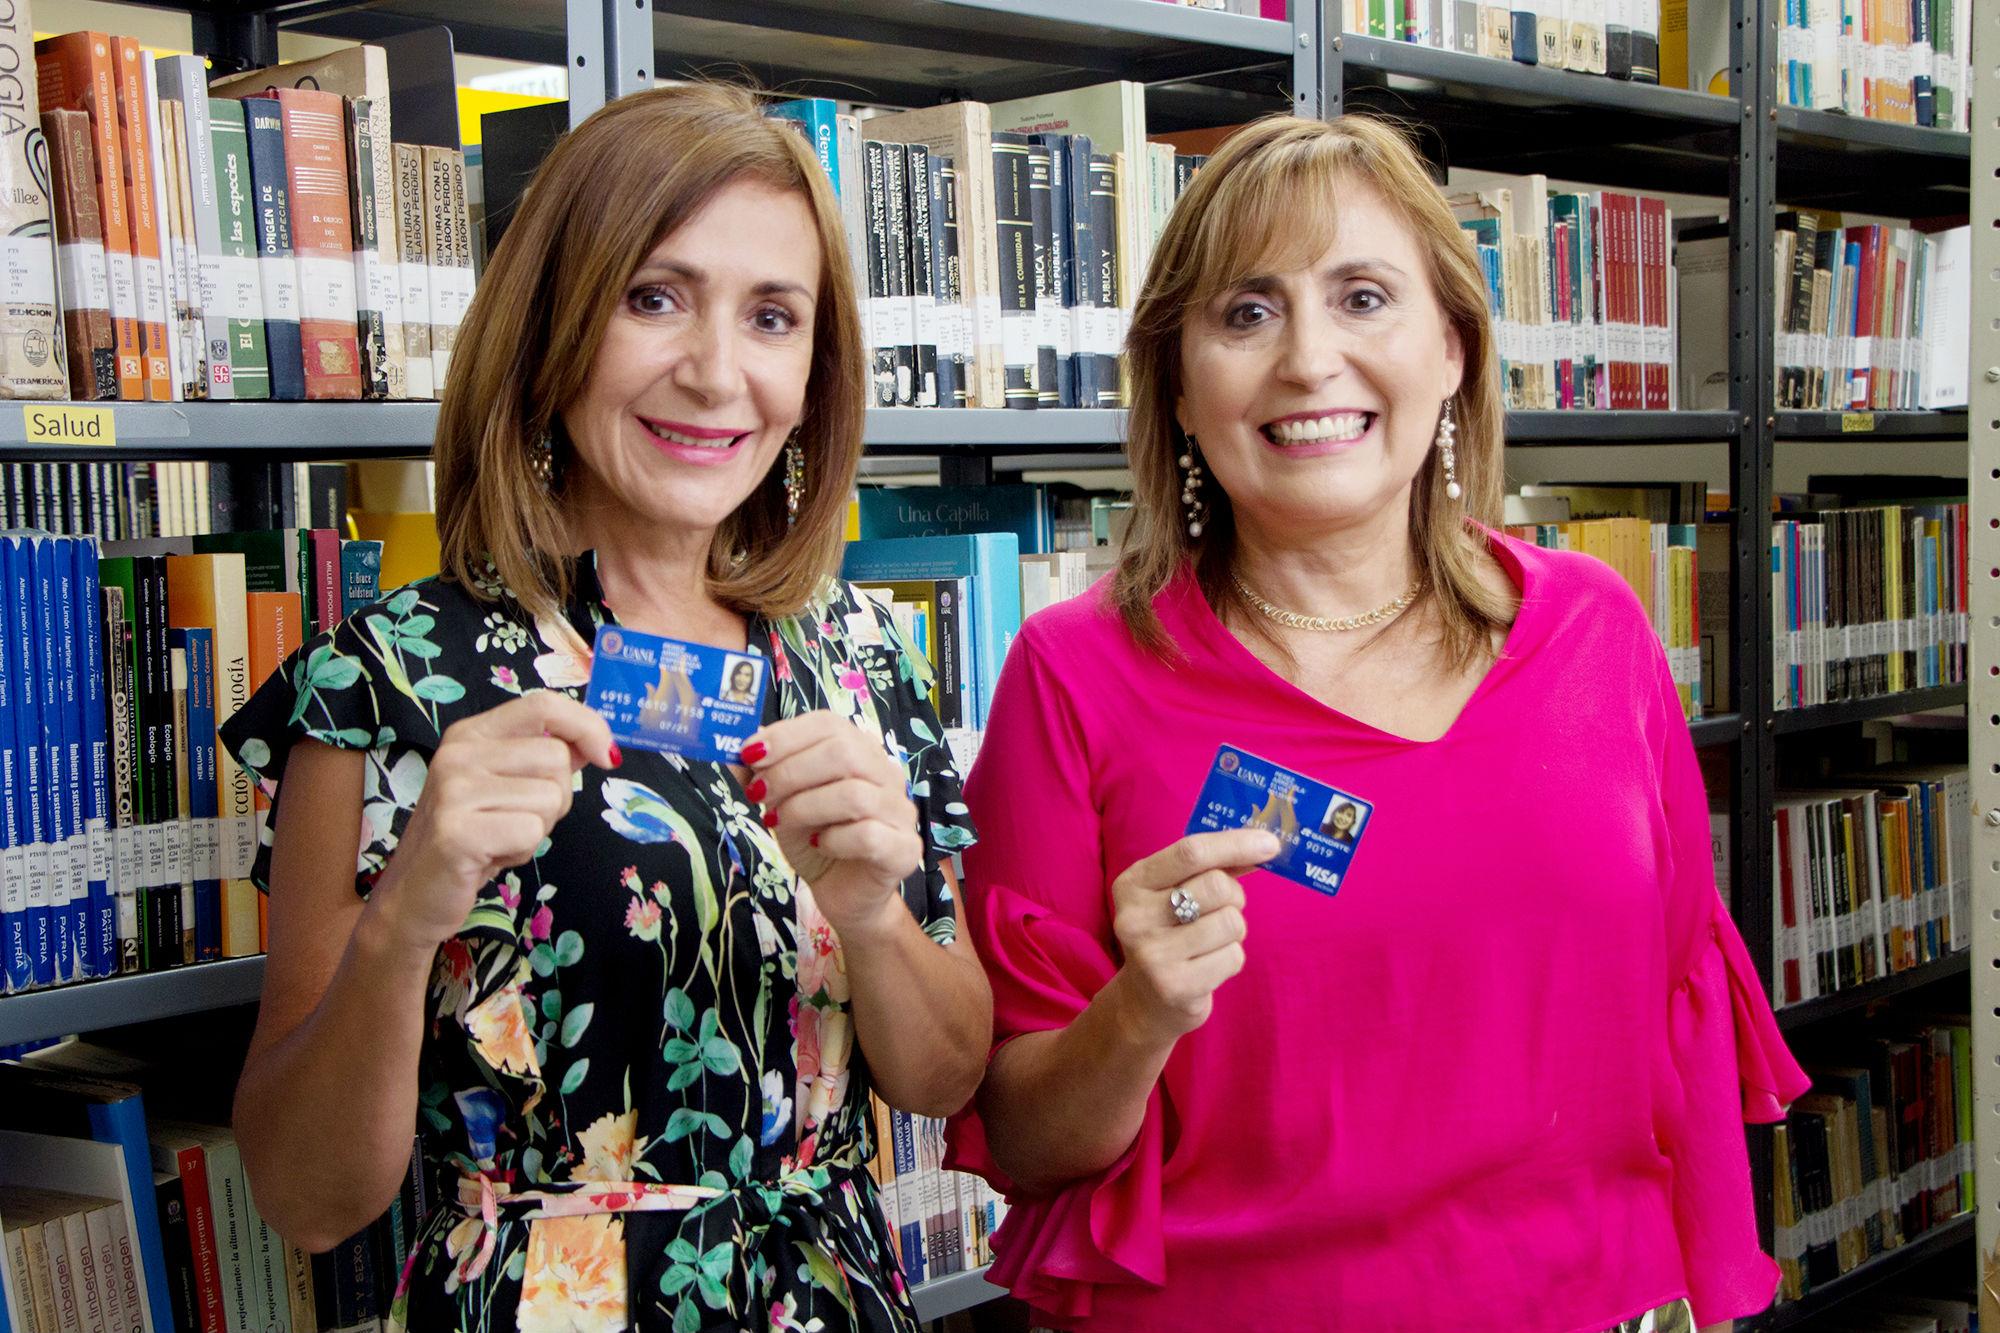 Las hermanas Georgina y Elvia Pérez Arrezola